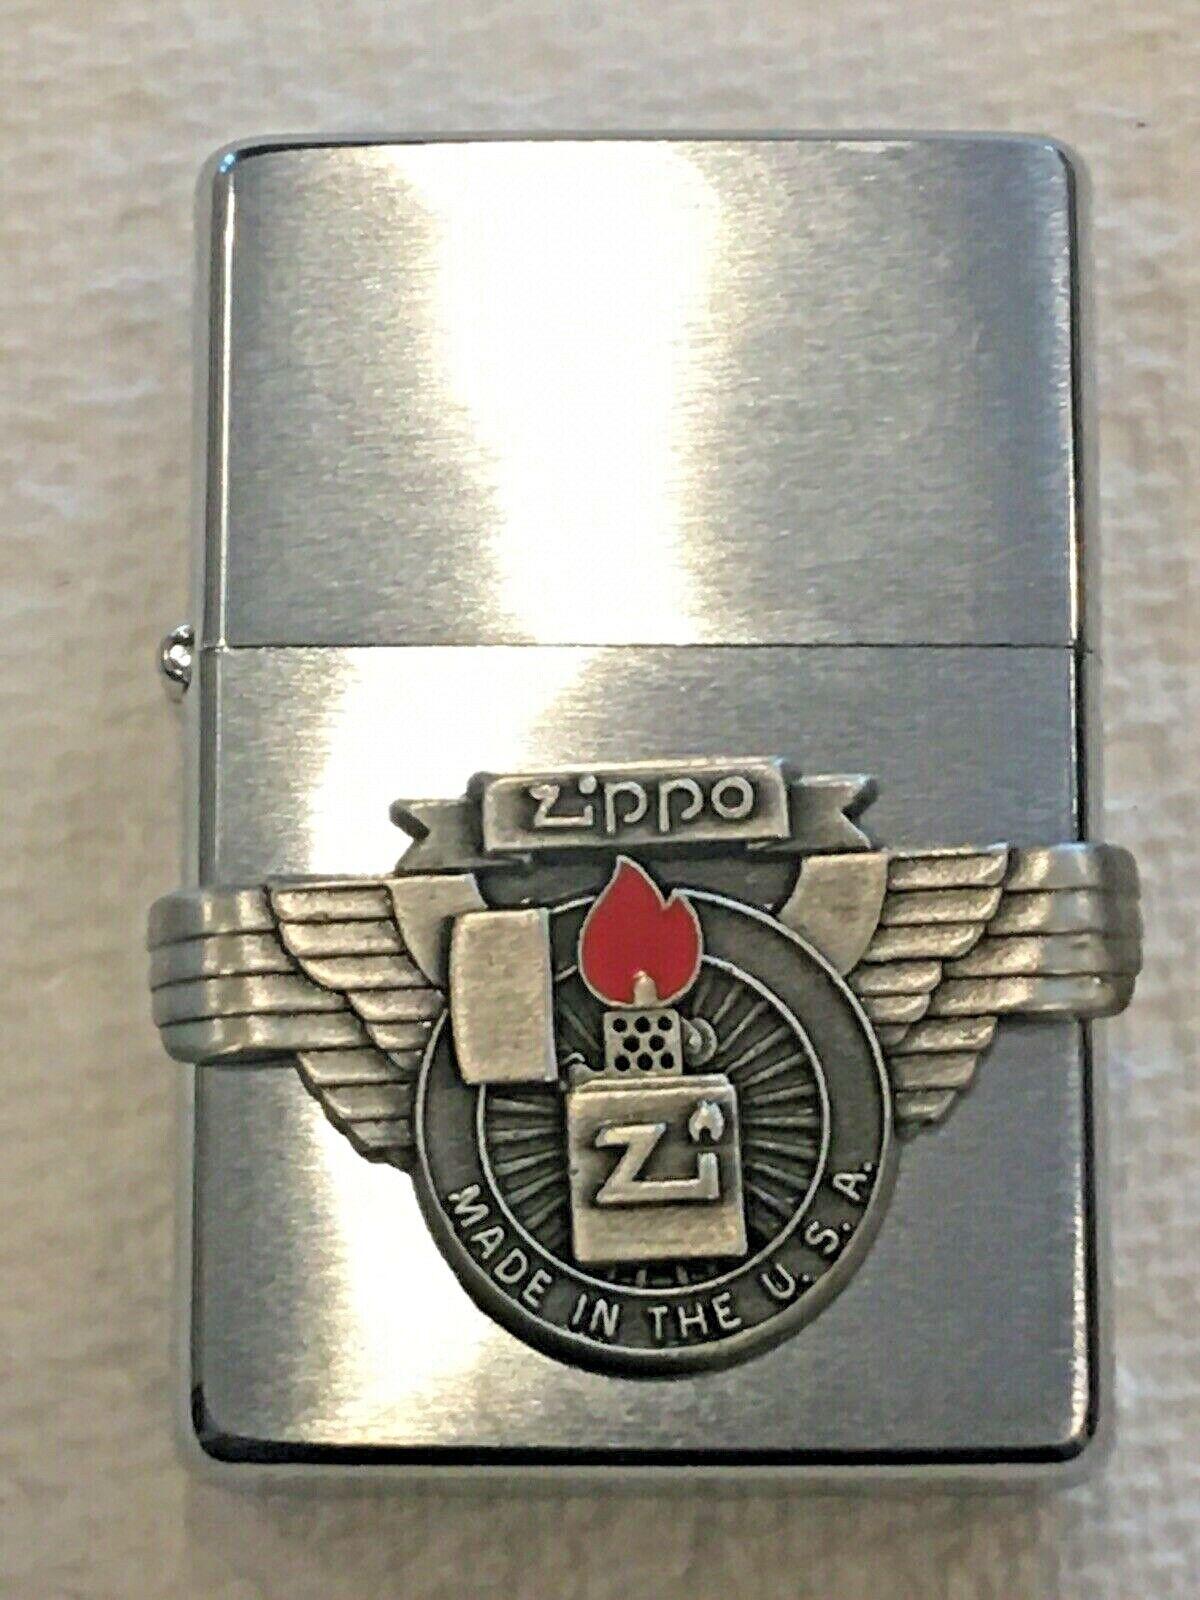 Zippo Lighter 582 Made USA Pewter New 1998